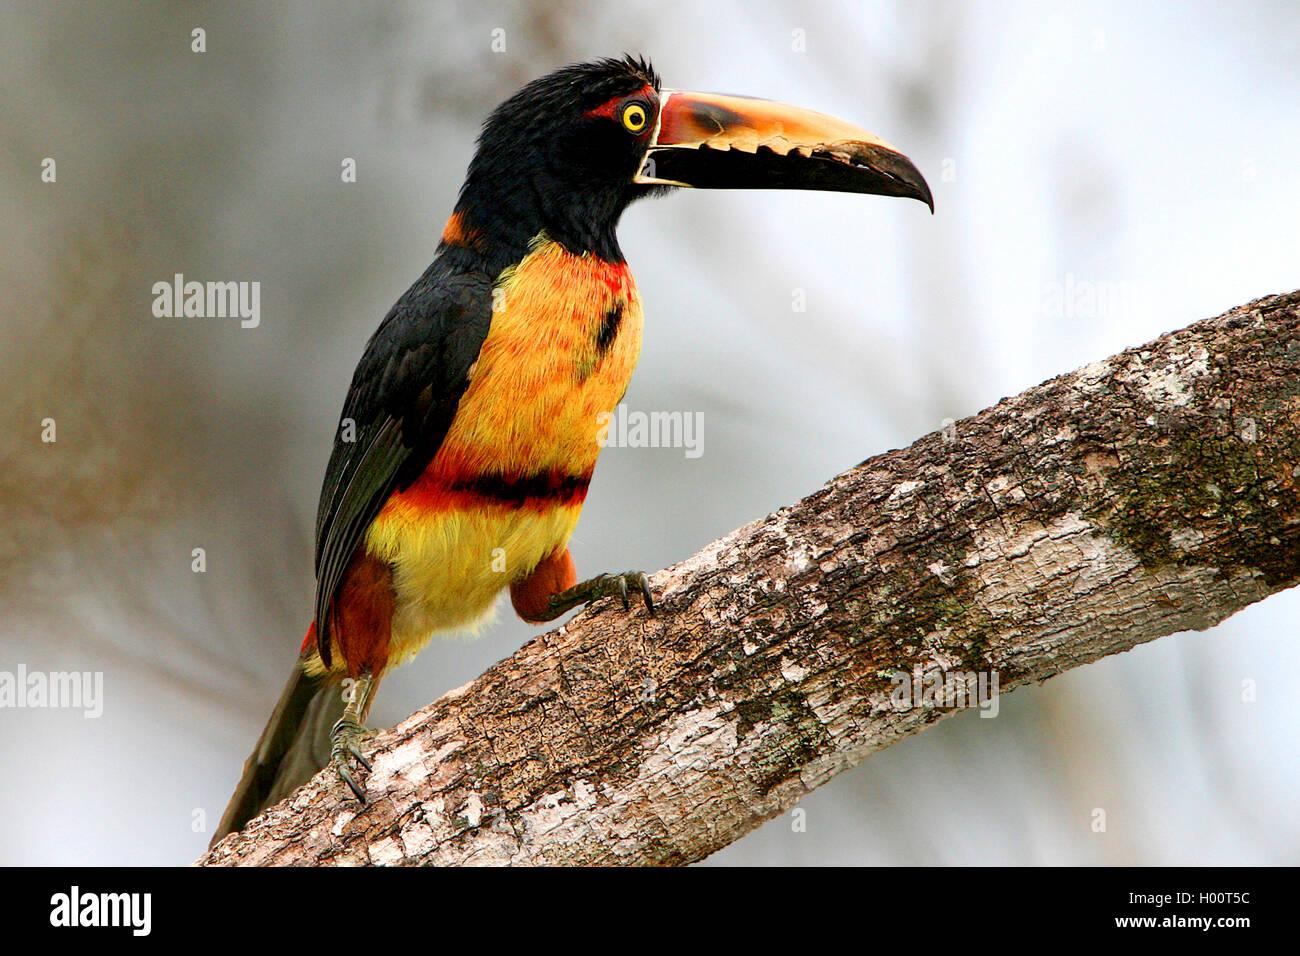 Halsbandarassari, Halsband-Arassari (Pteroglossus torquatus), sitzt auf einem Ast, Costa Rica   aracari a collare Immagini Stock